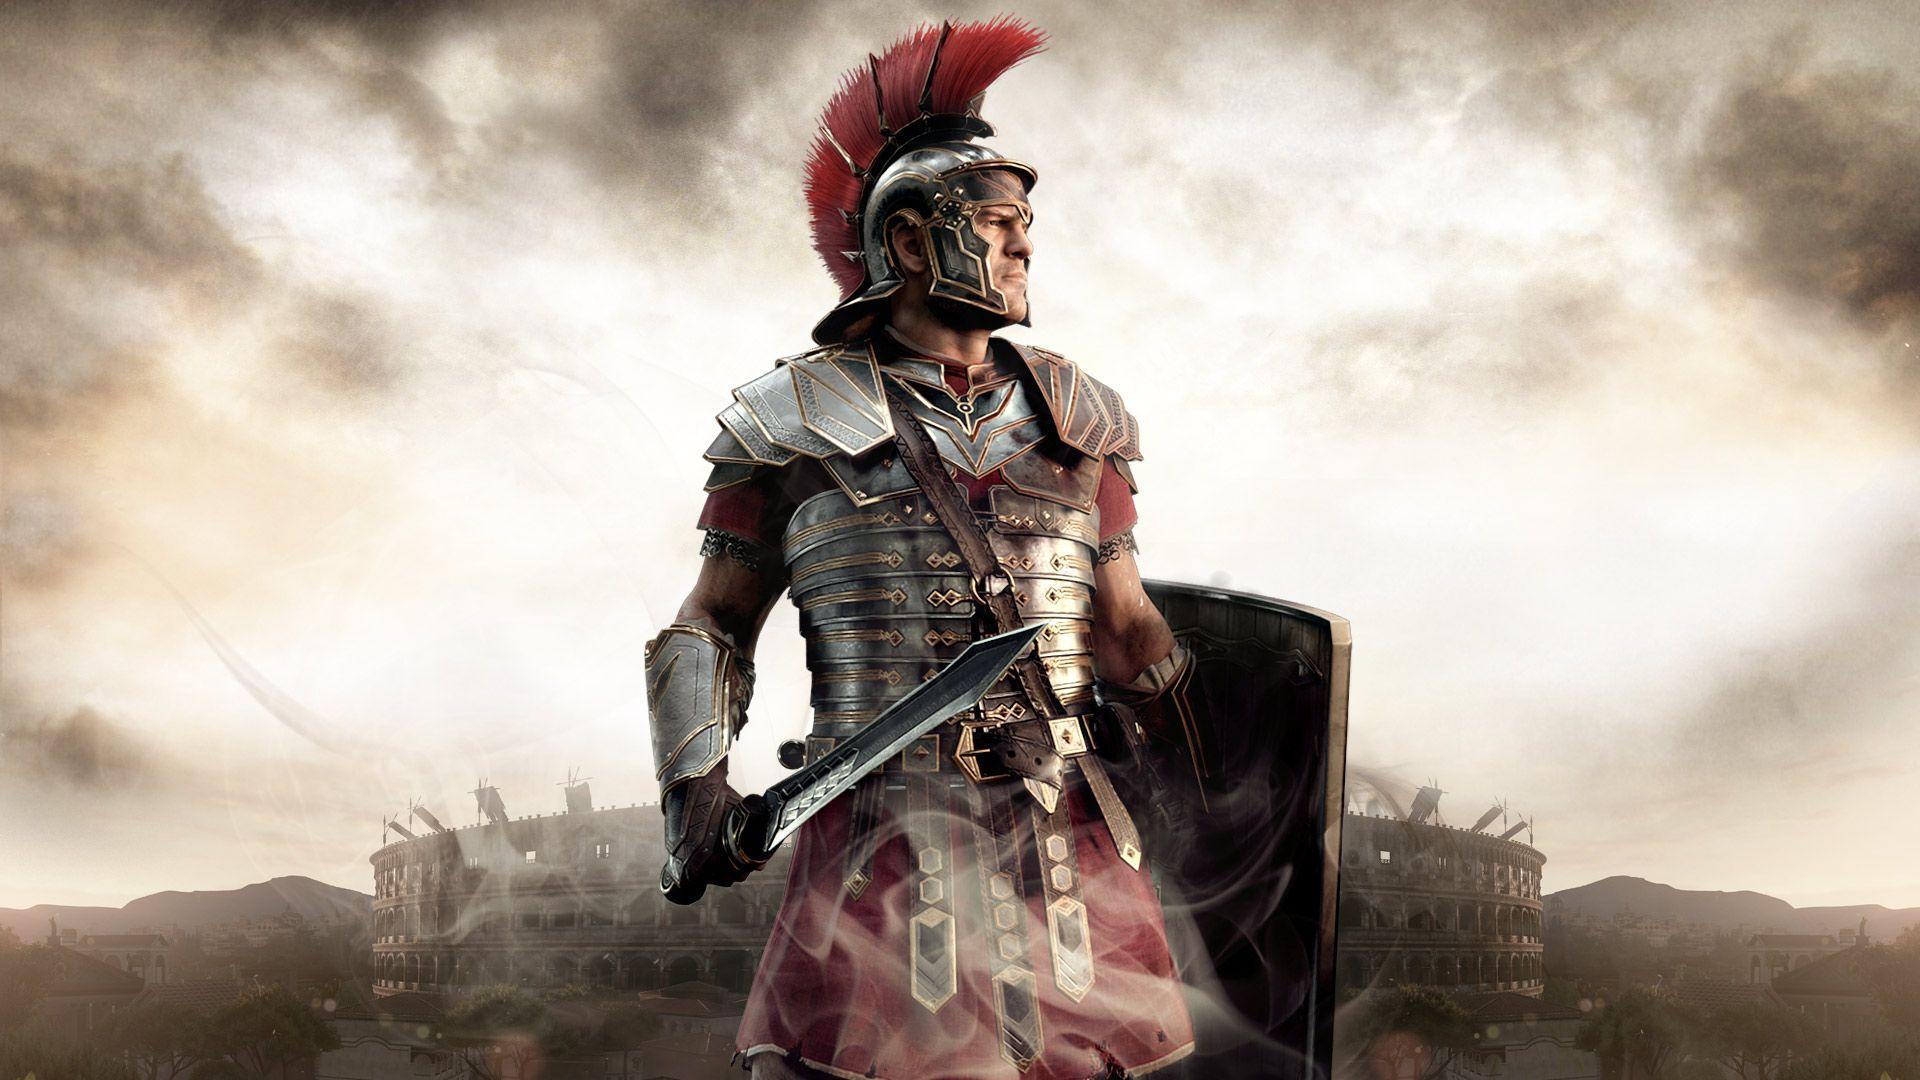 Cool Roman Centurion Wallpapers Top Free Cool Roman